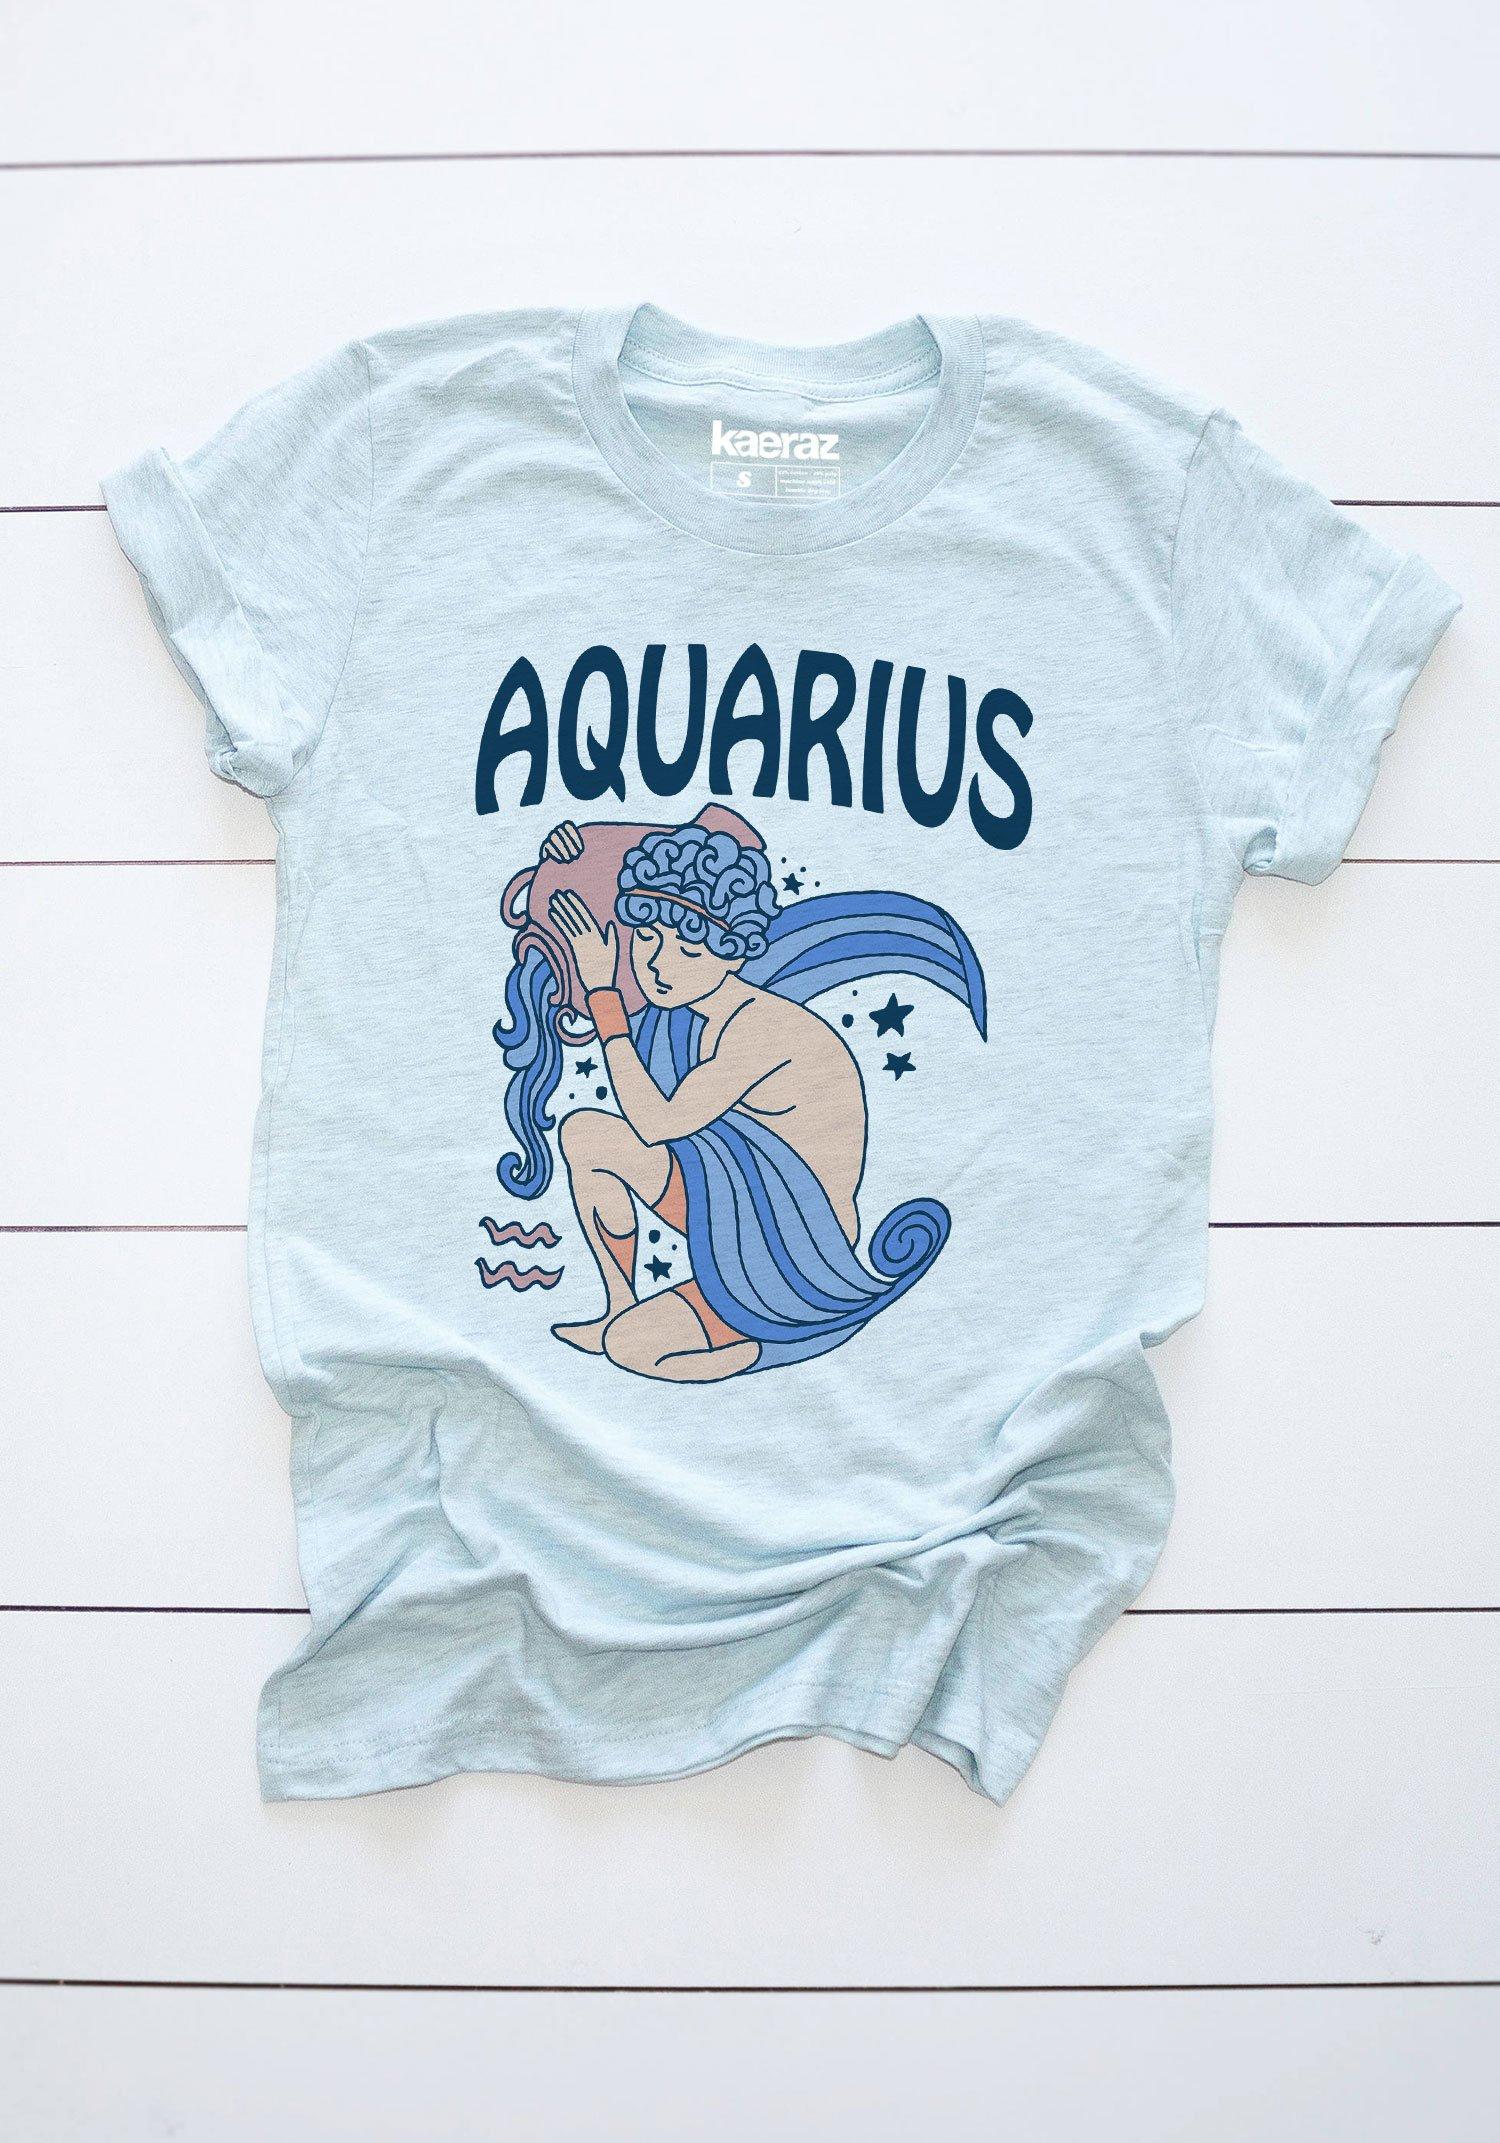 chrissihernandez-kaeraz-horoscope-tee-aquarius.jpg